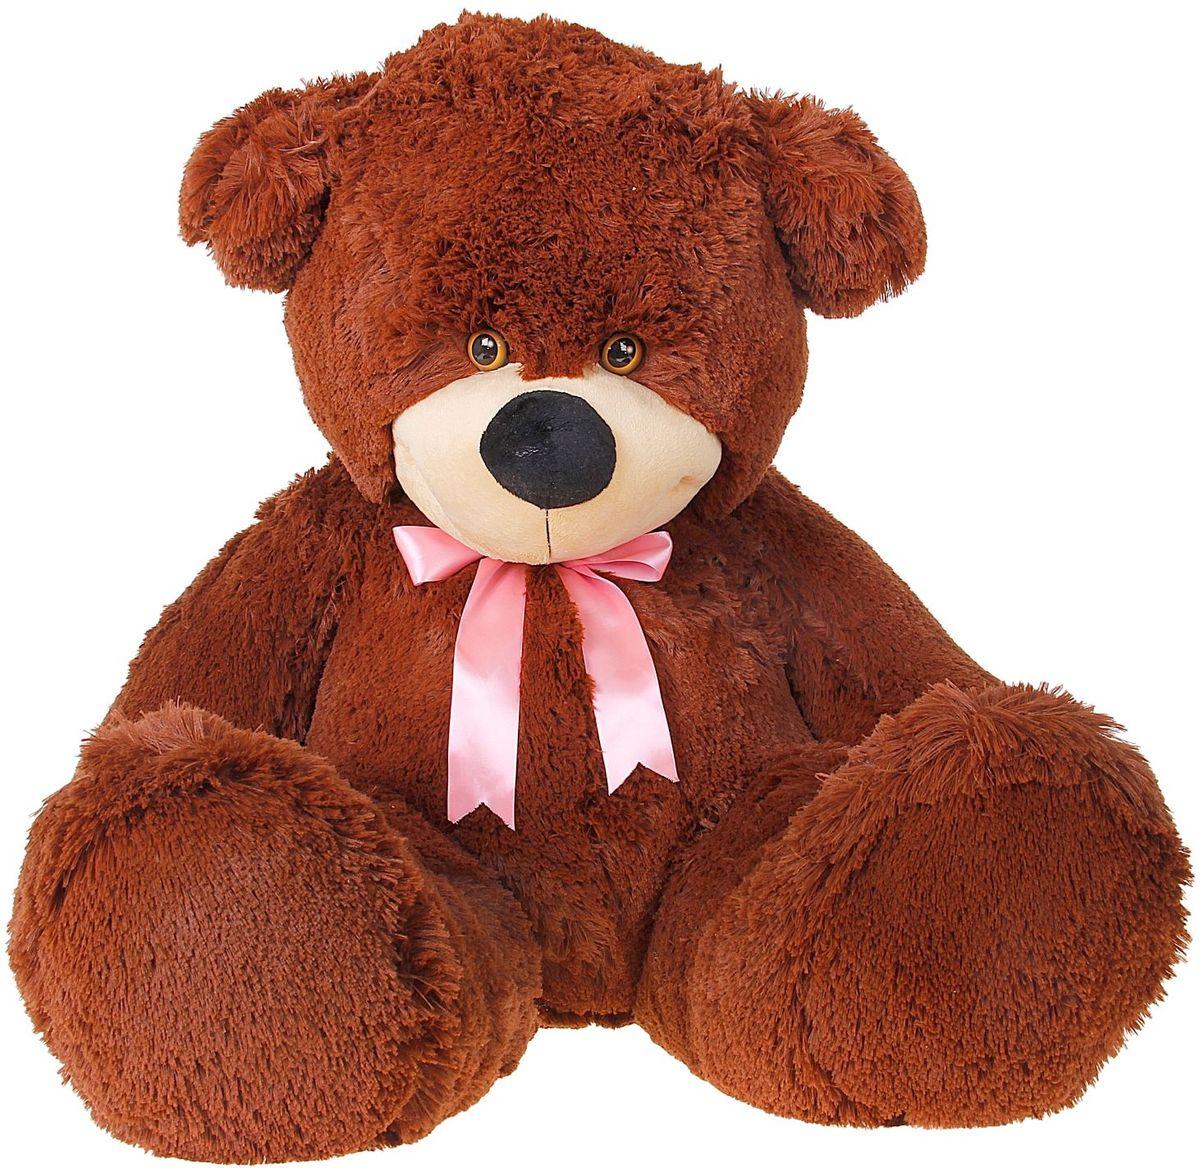 888 Мягкая игрушка Медведь Арчи 80 см 331936 888 ultra